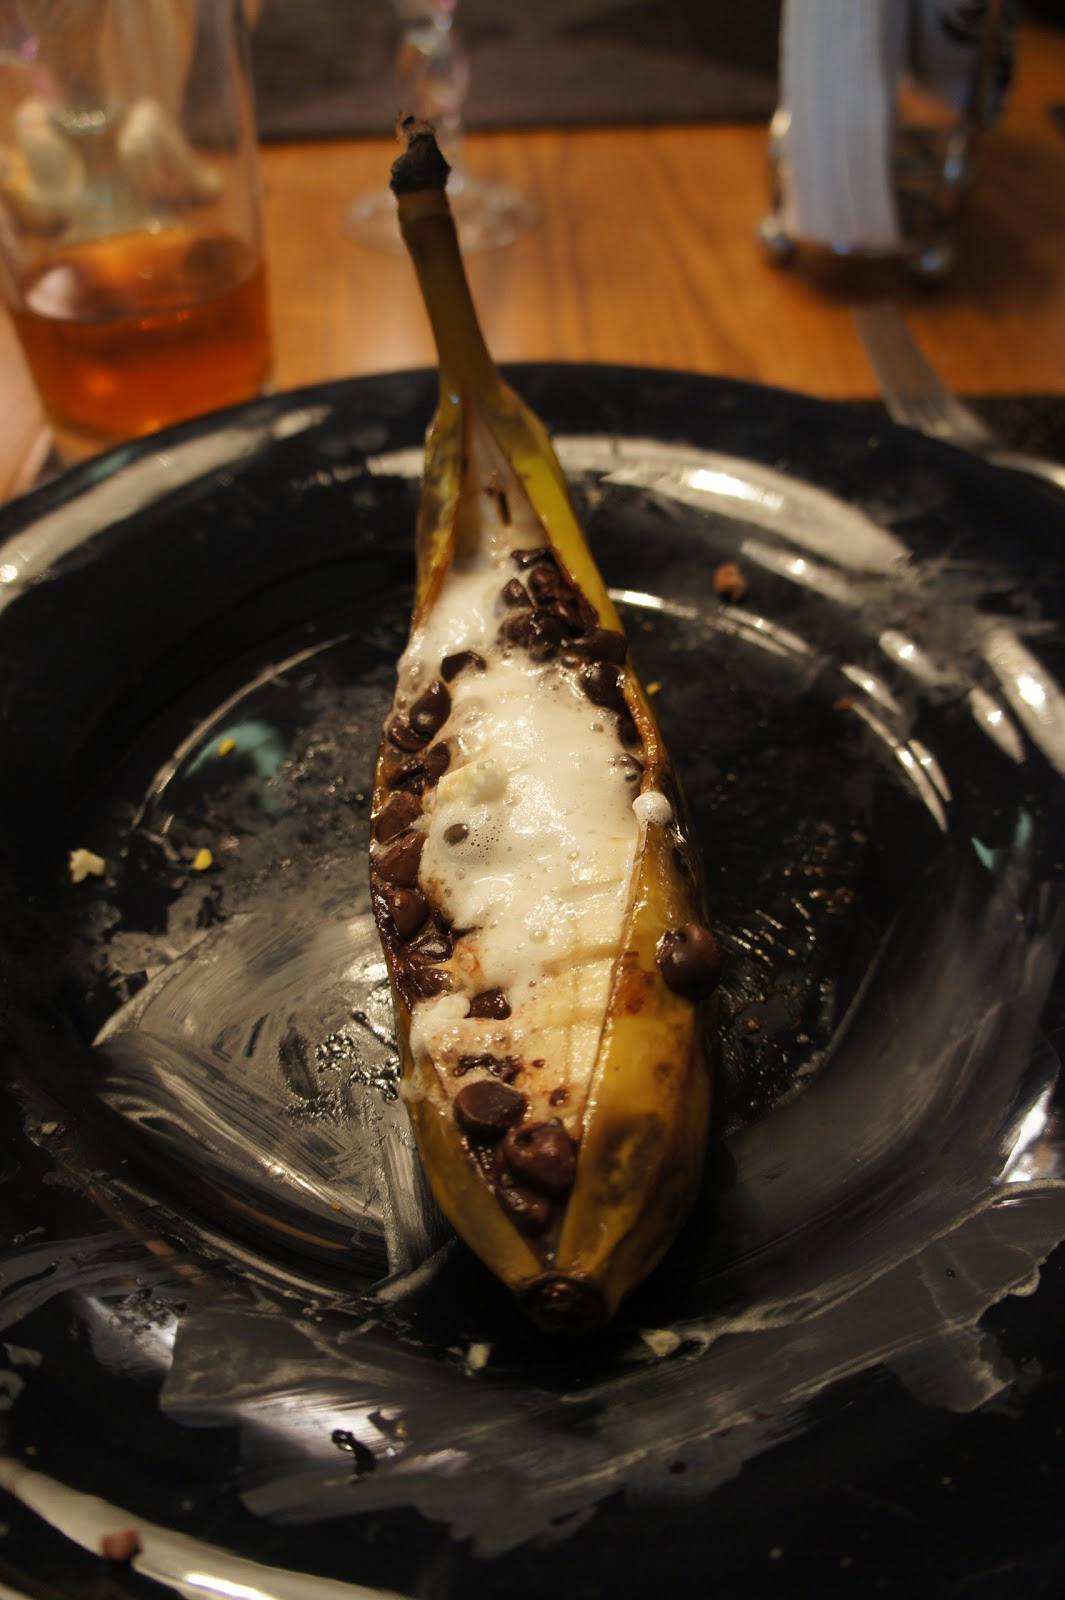 Something Yummy for your Tummy!!: Campfire Banana Splits